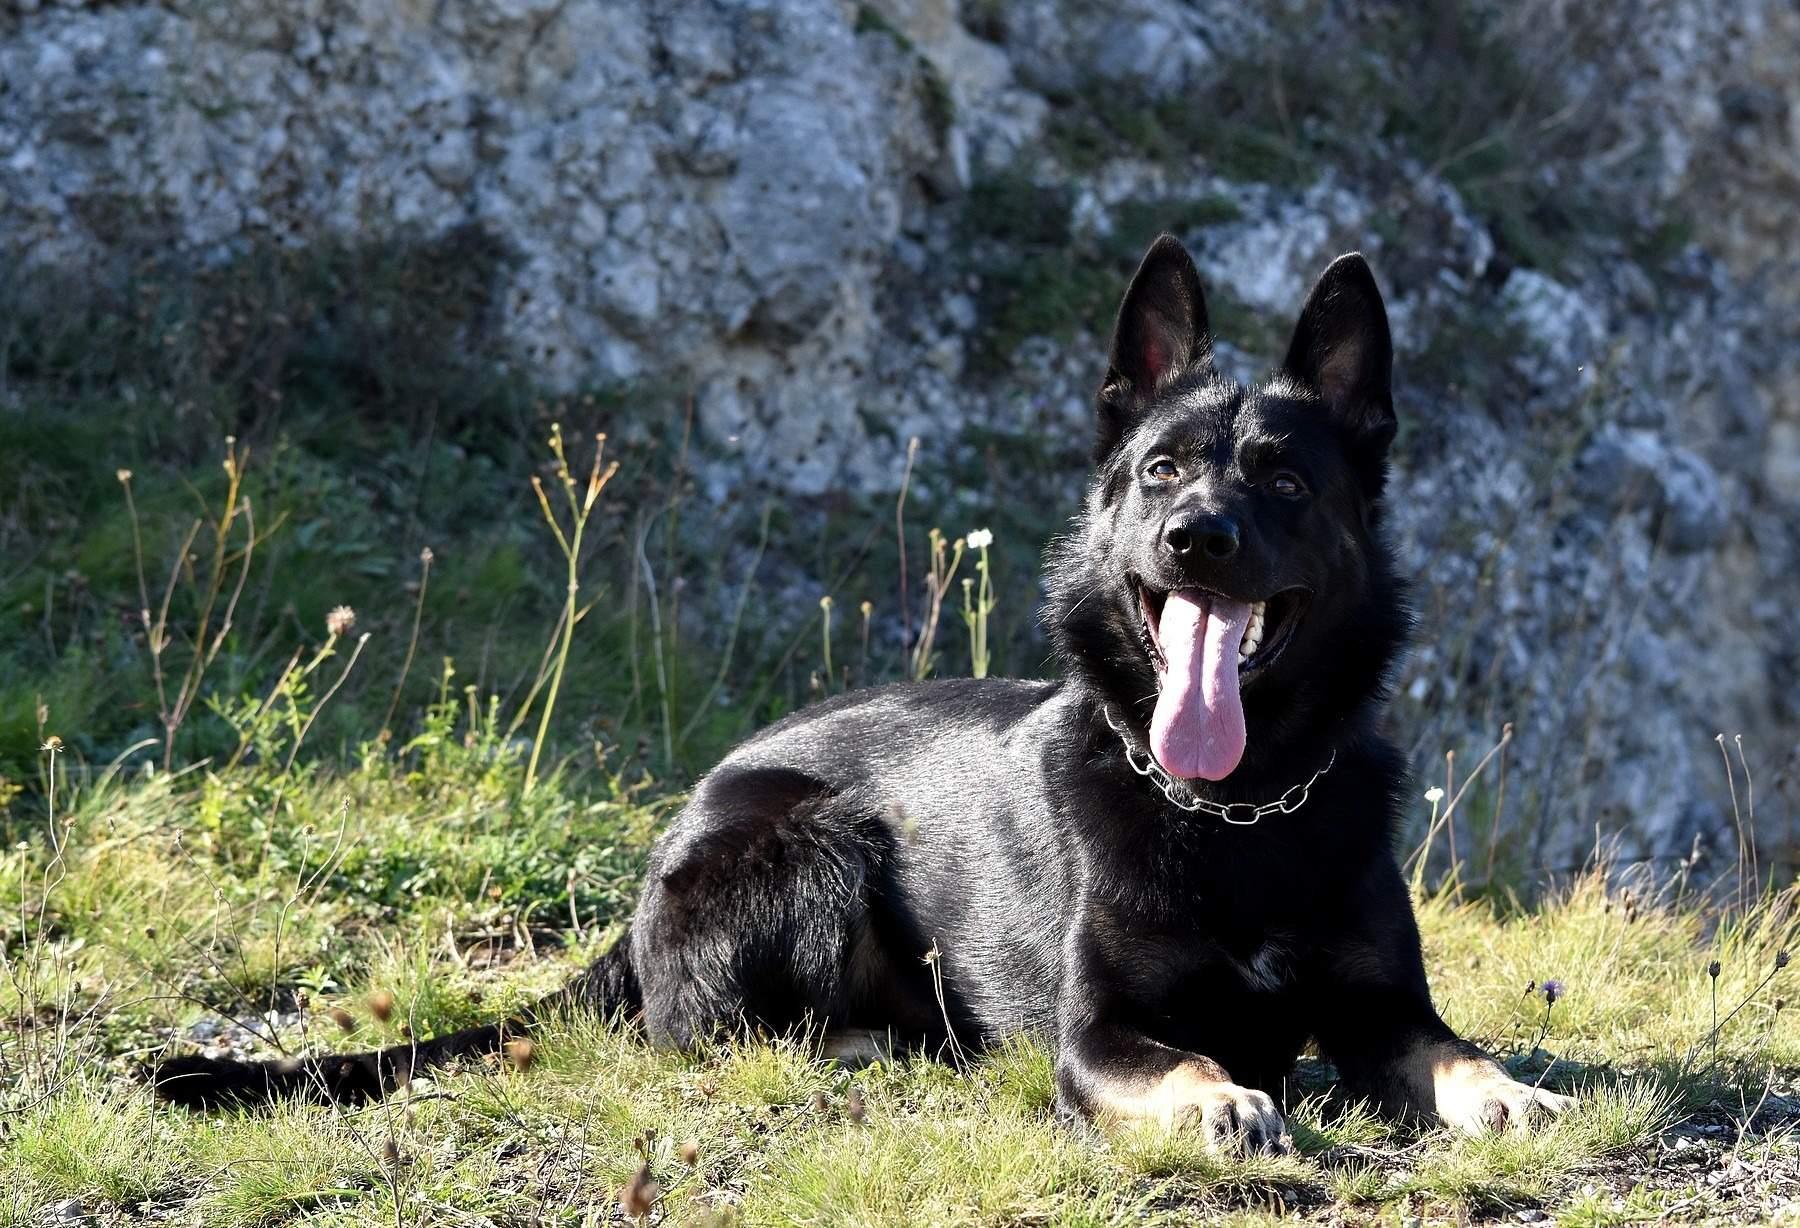 Bolle Janaka Grandson TOP Titled German Shepherd for Sale petworldglobal.com